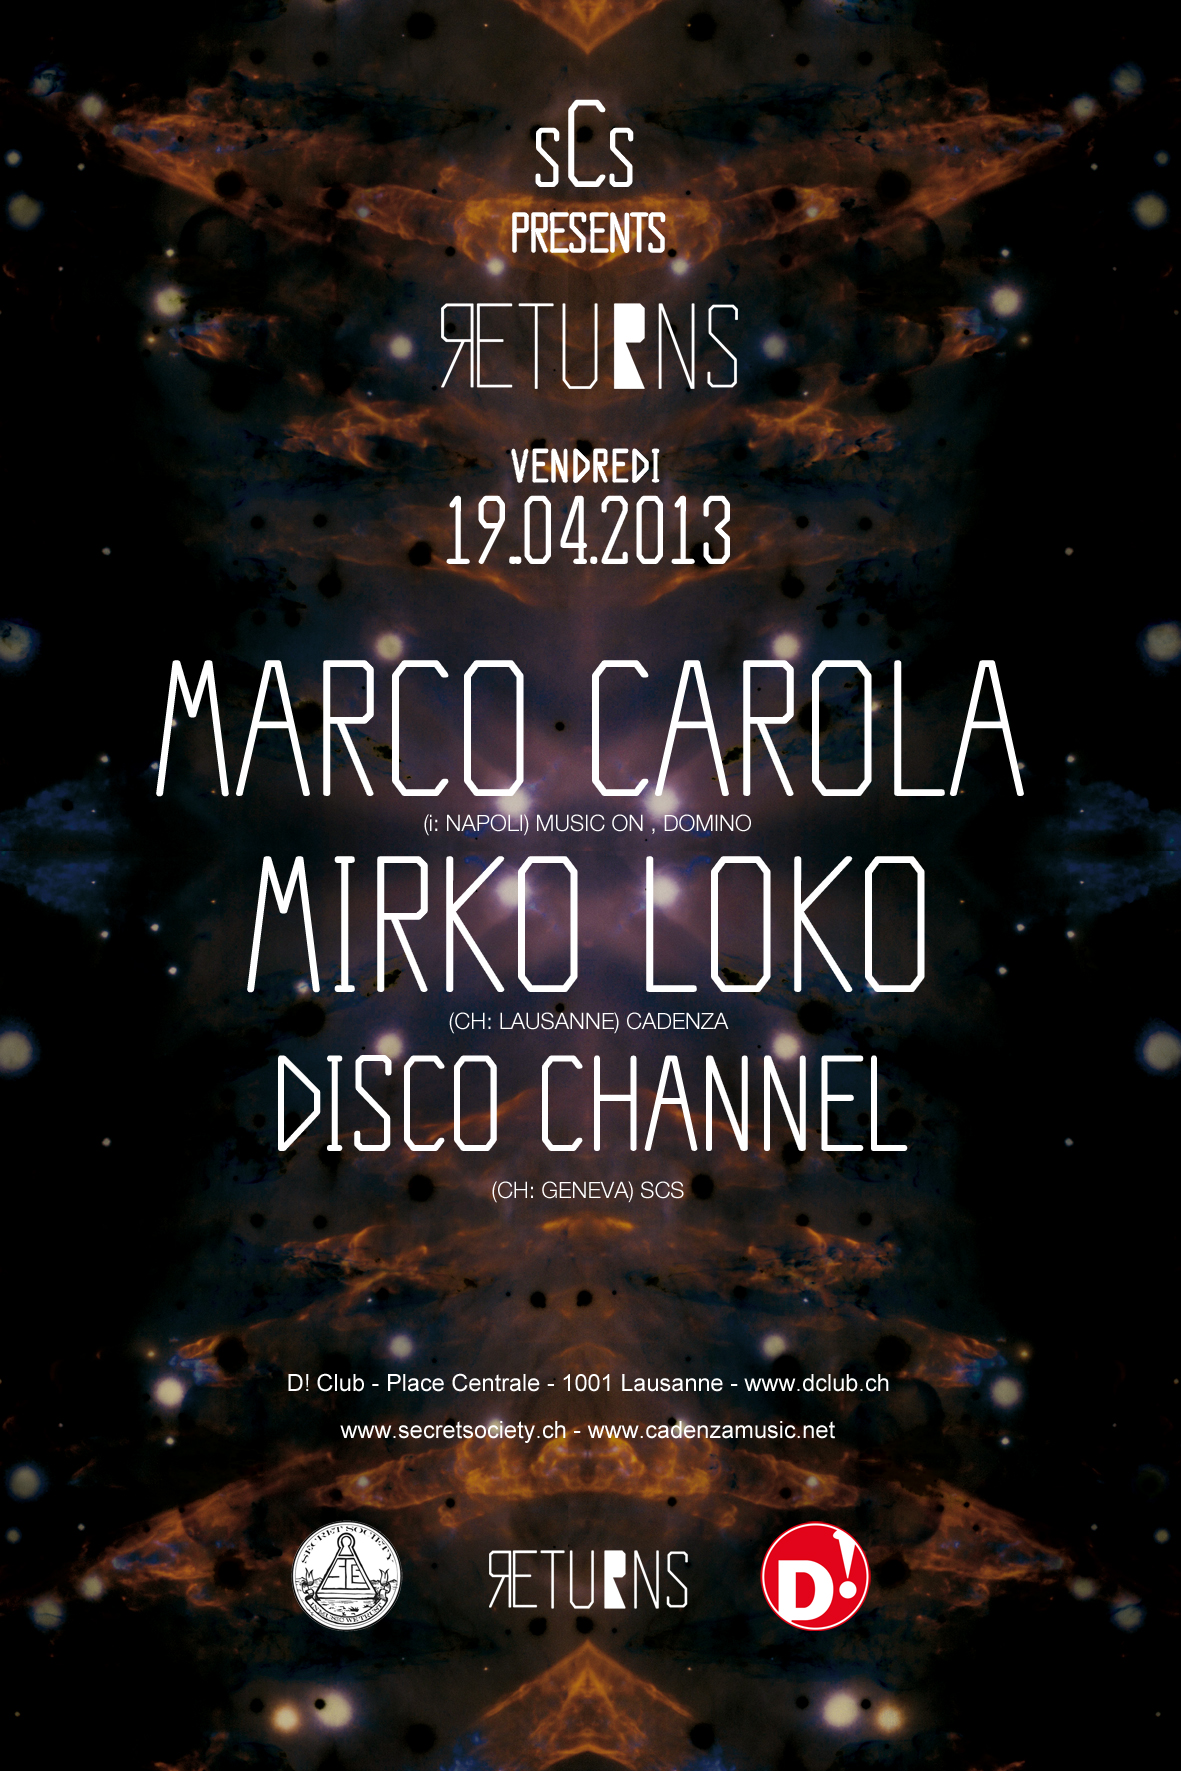 Marco Carola & Mirko Loko - @D! Club